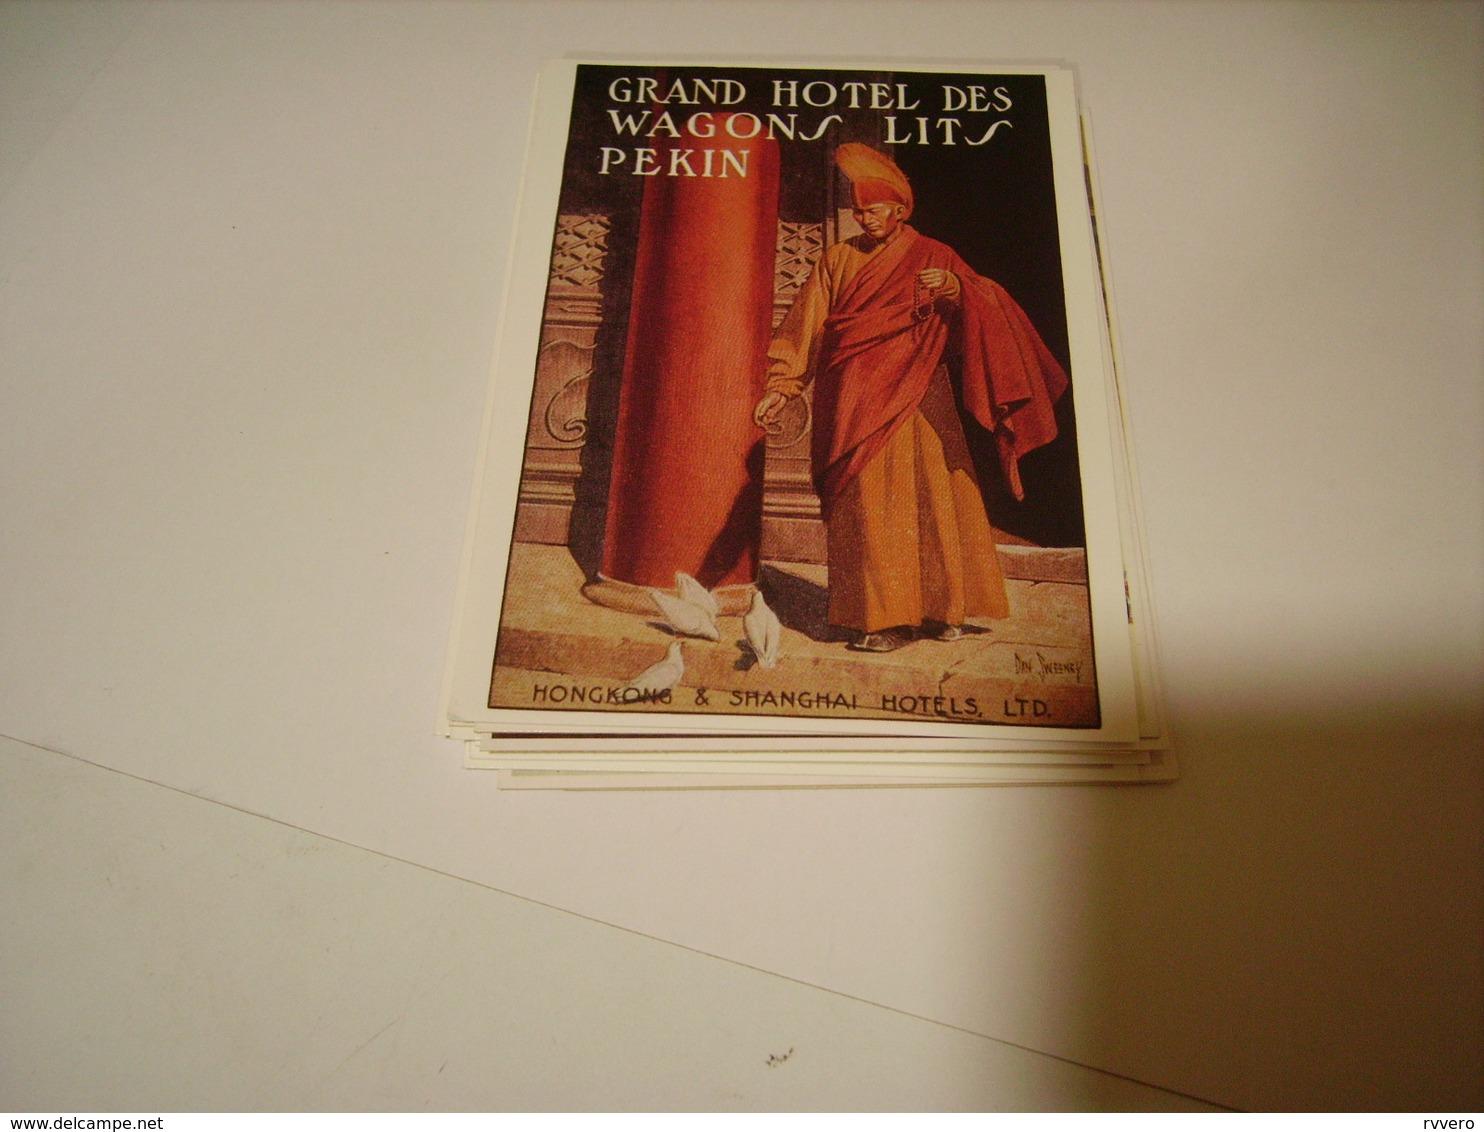 PUBLICITE GRAND HOTEL DES WAGONS LITS PEKIN - France